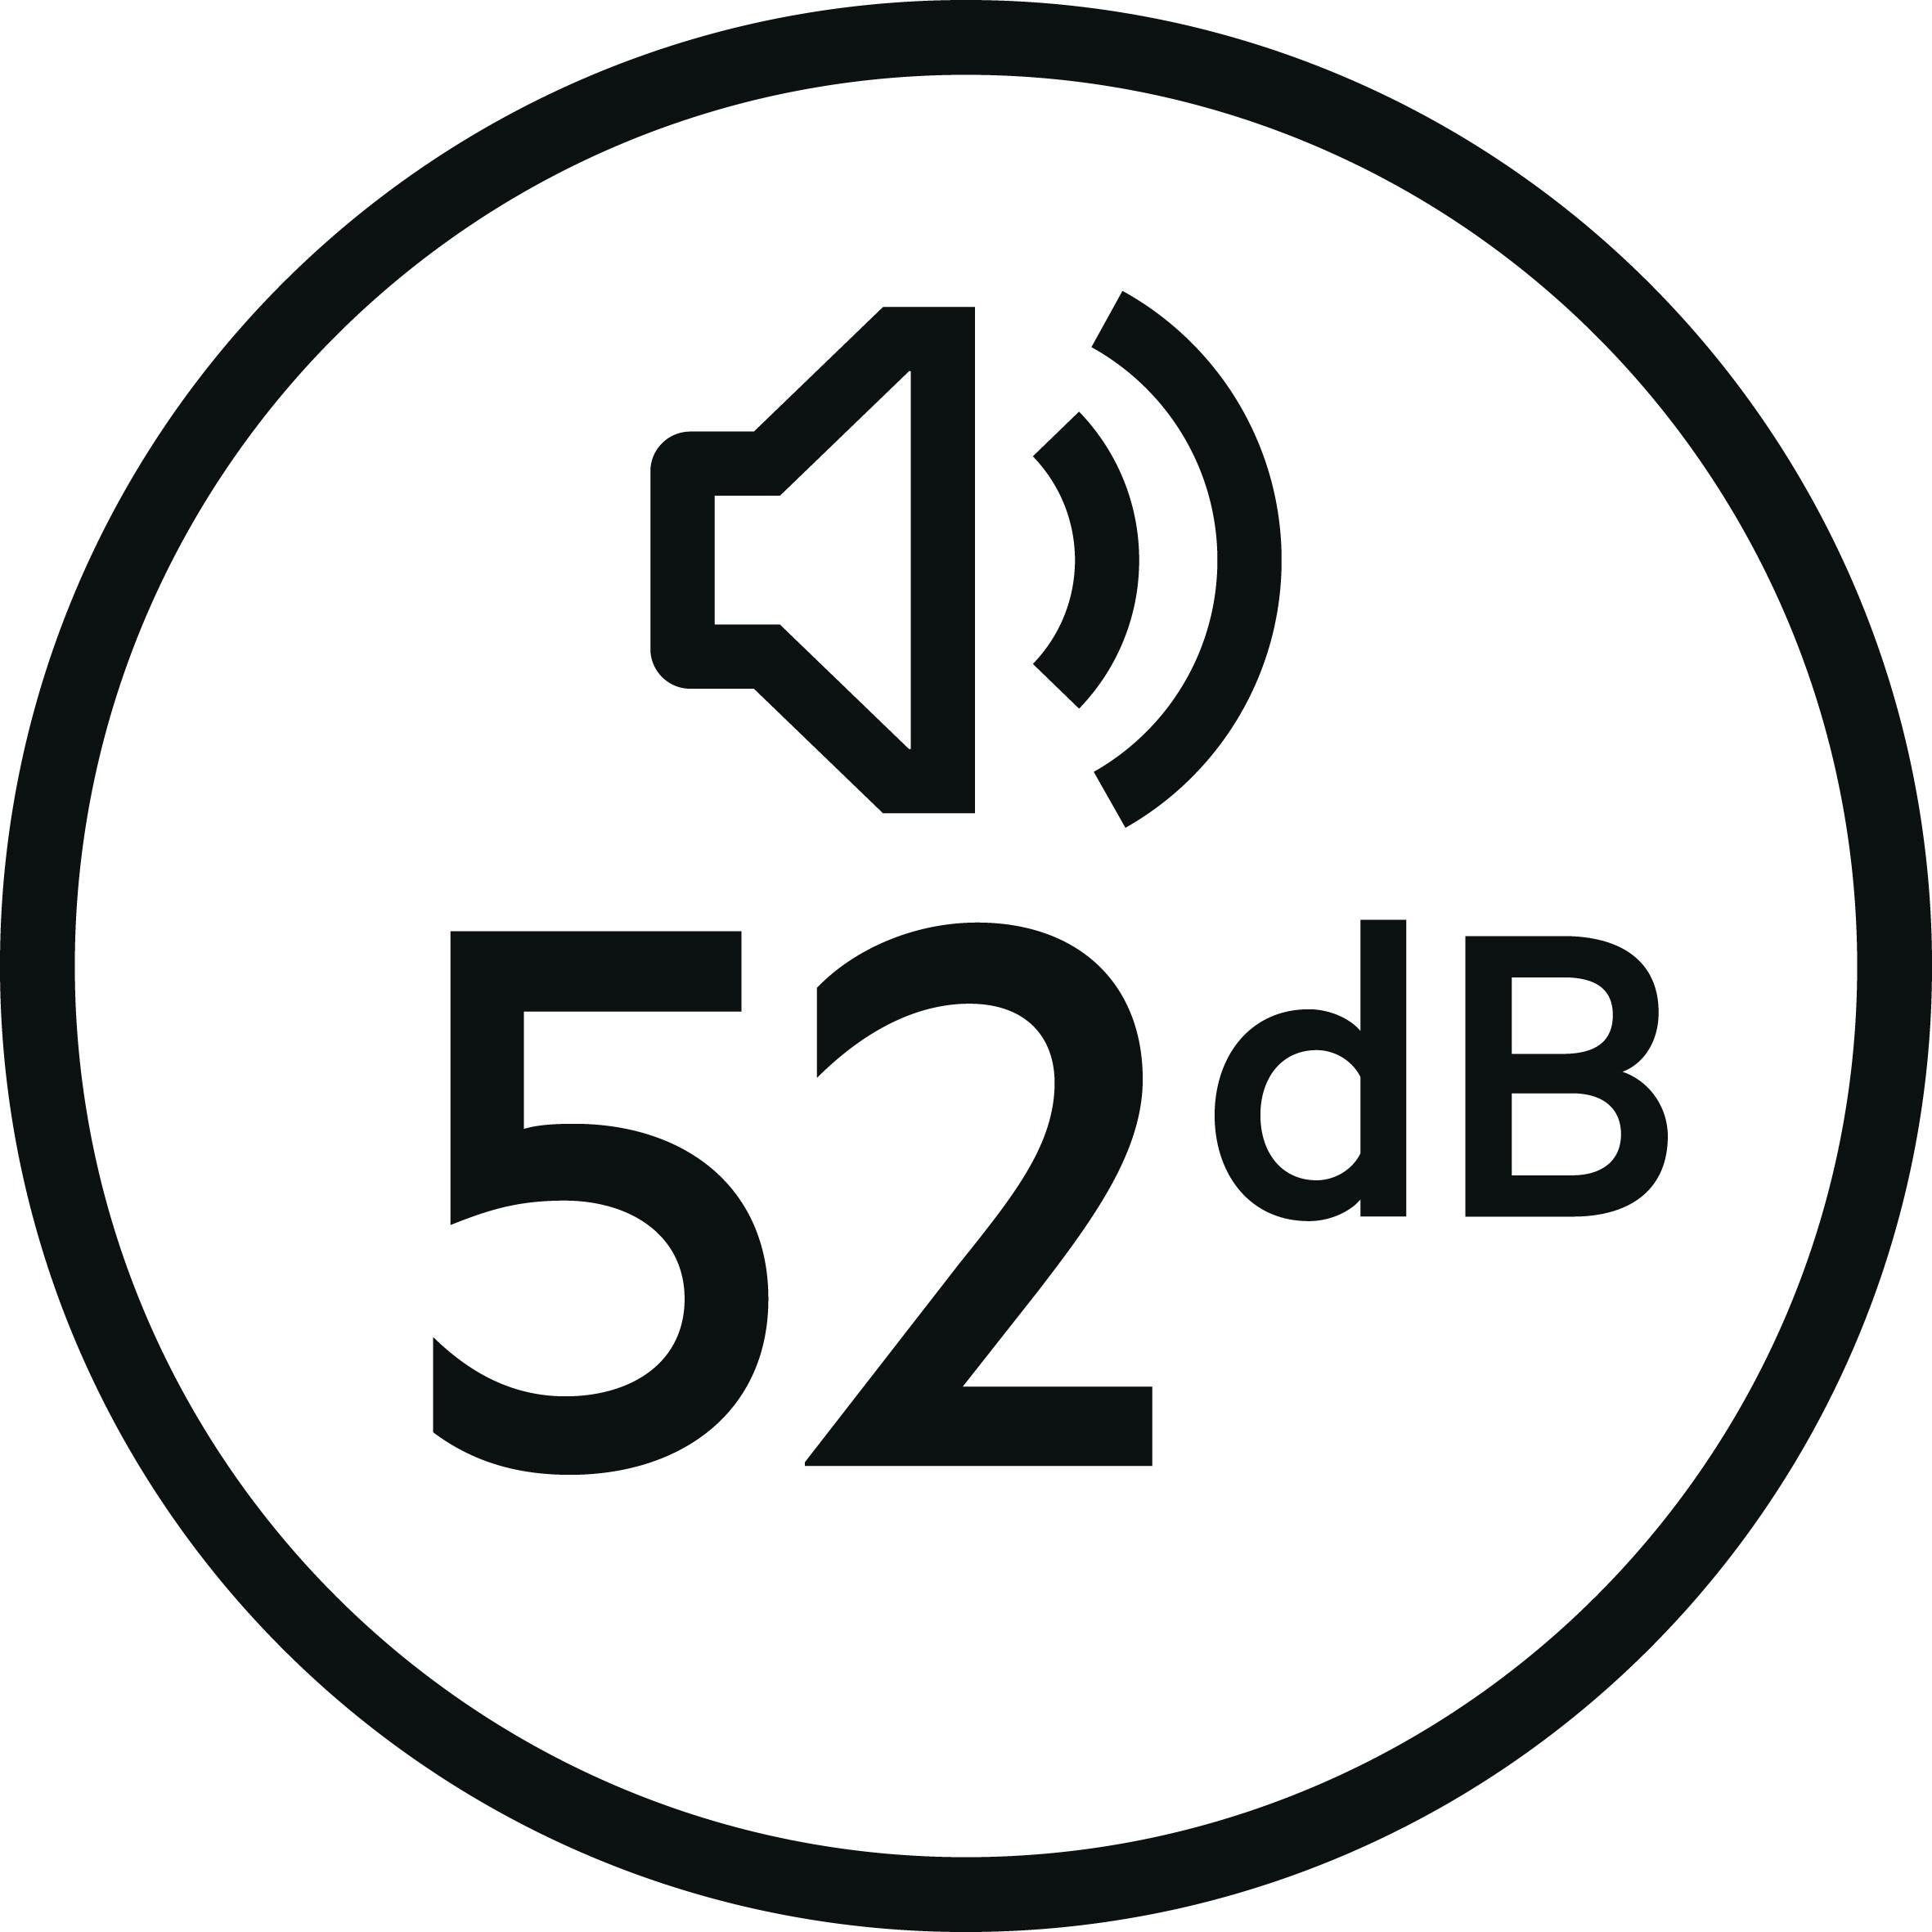 52dB-PSAAAP16PC569039.jpg